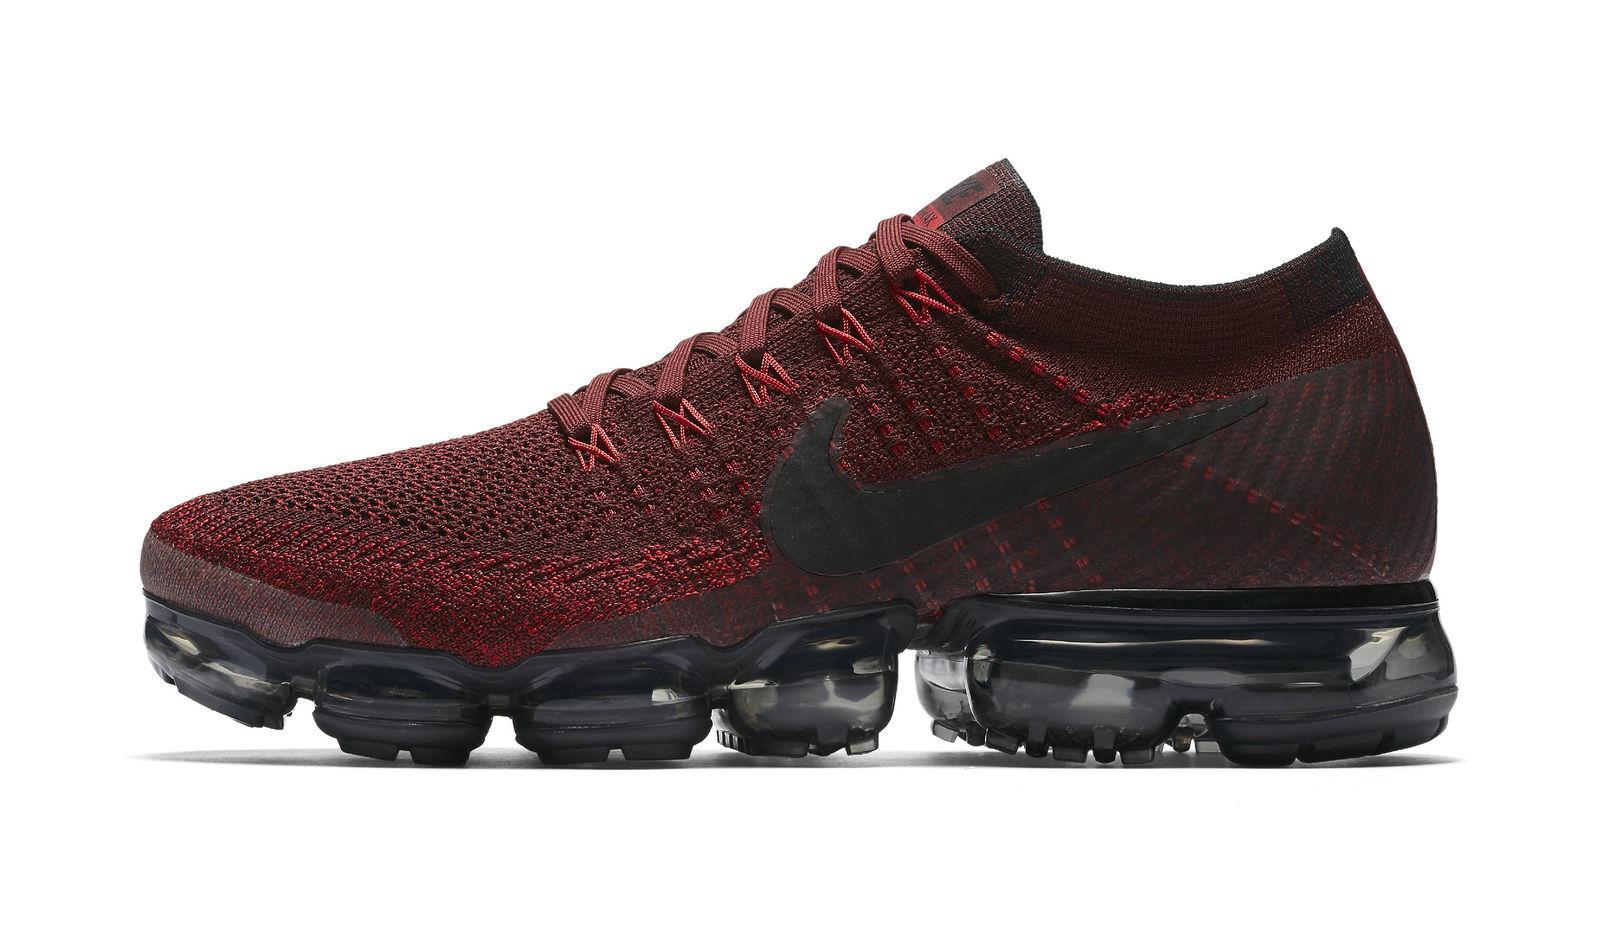 ecbd3c952a6b Nike Air Vapormax Flyknit Dark Team Red Black Mens Running Shoes ...